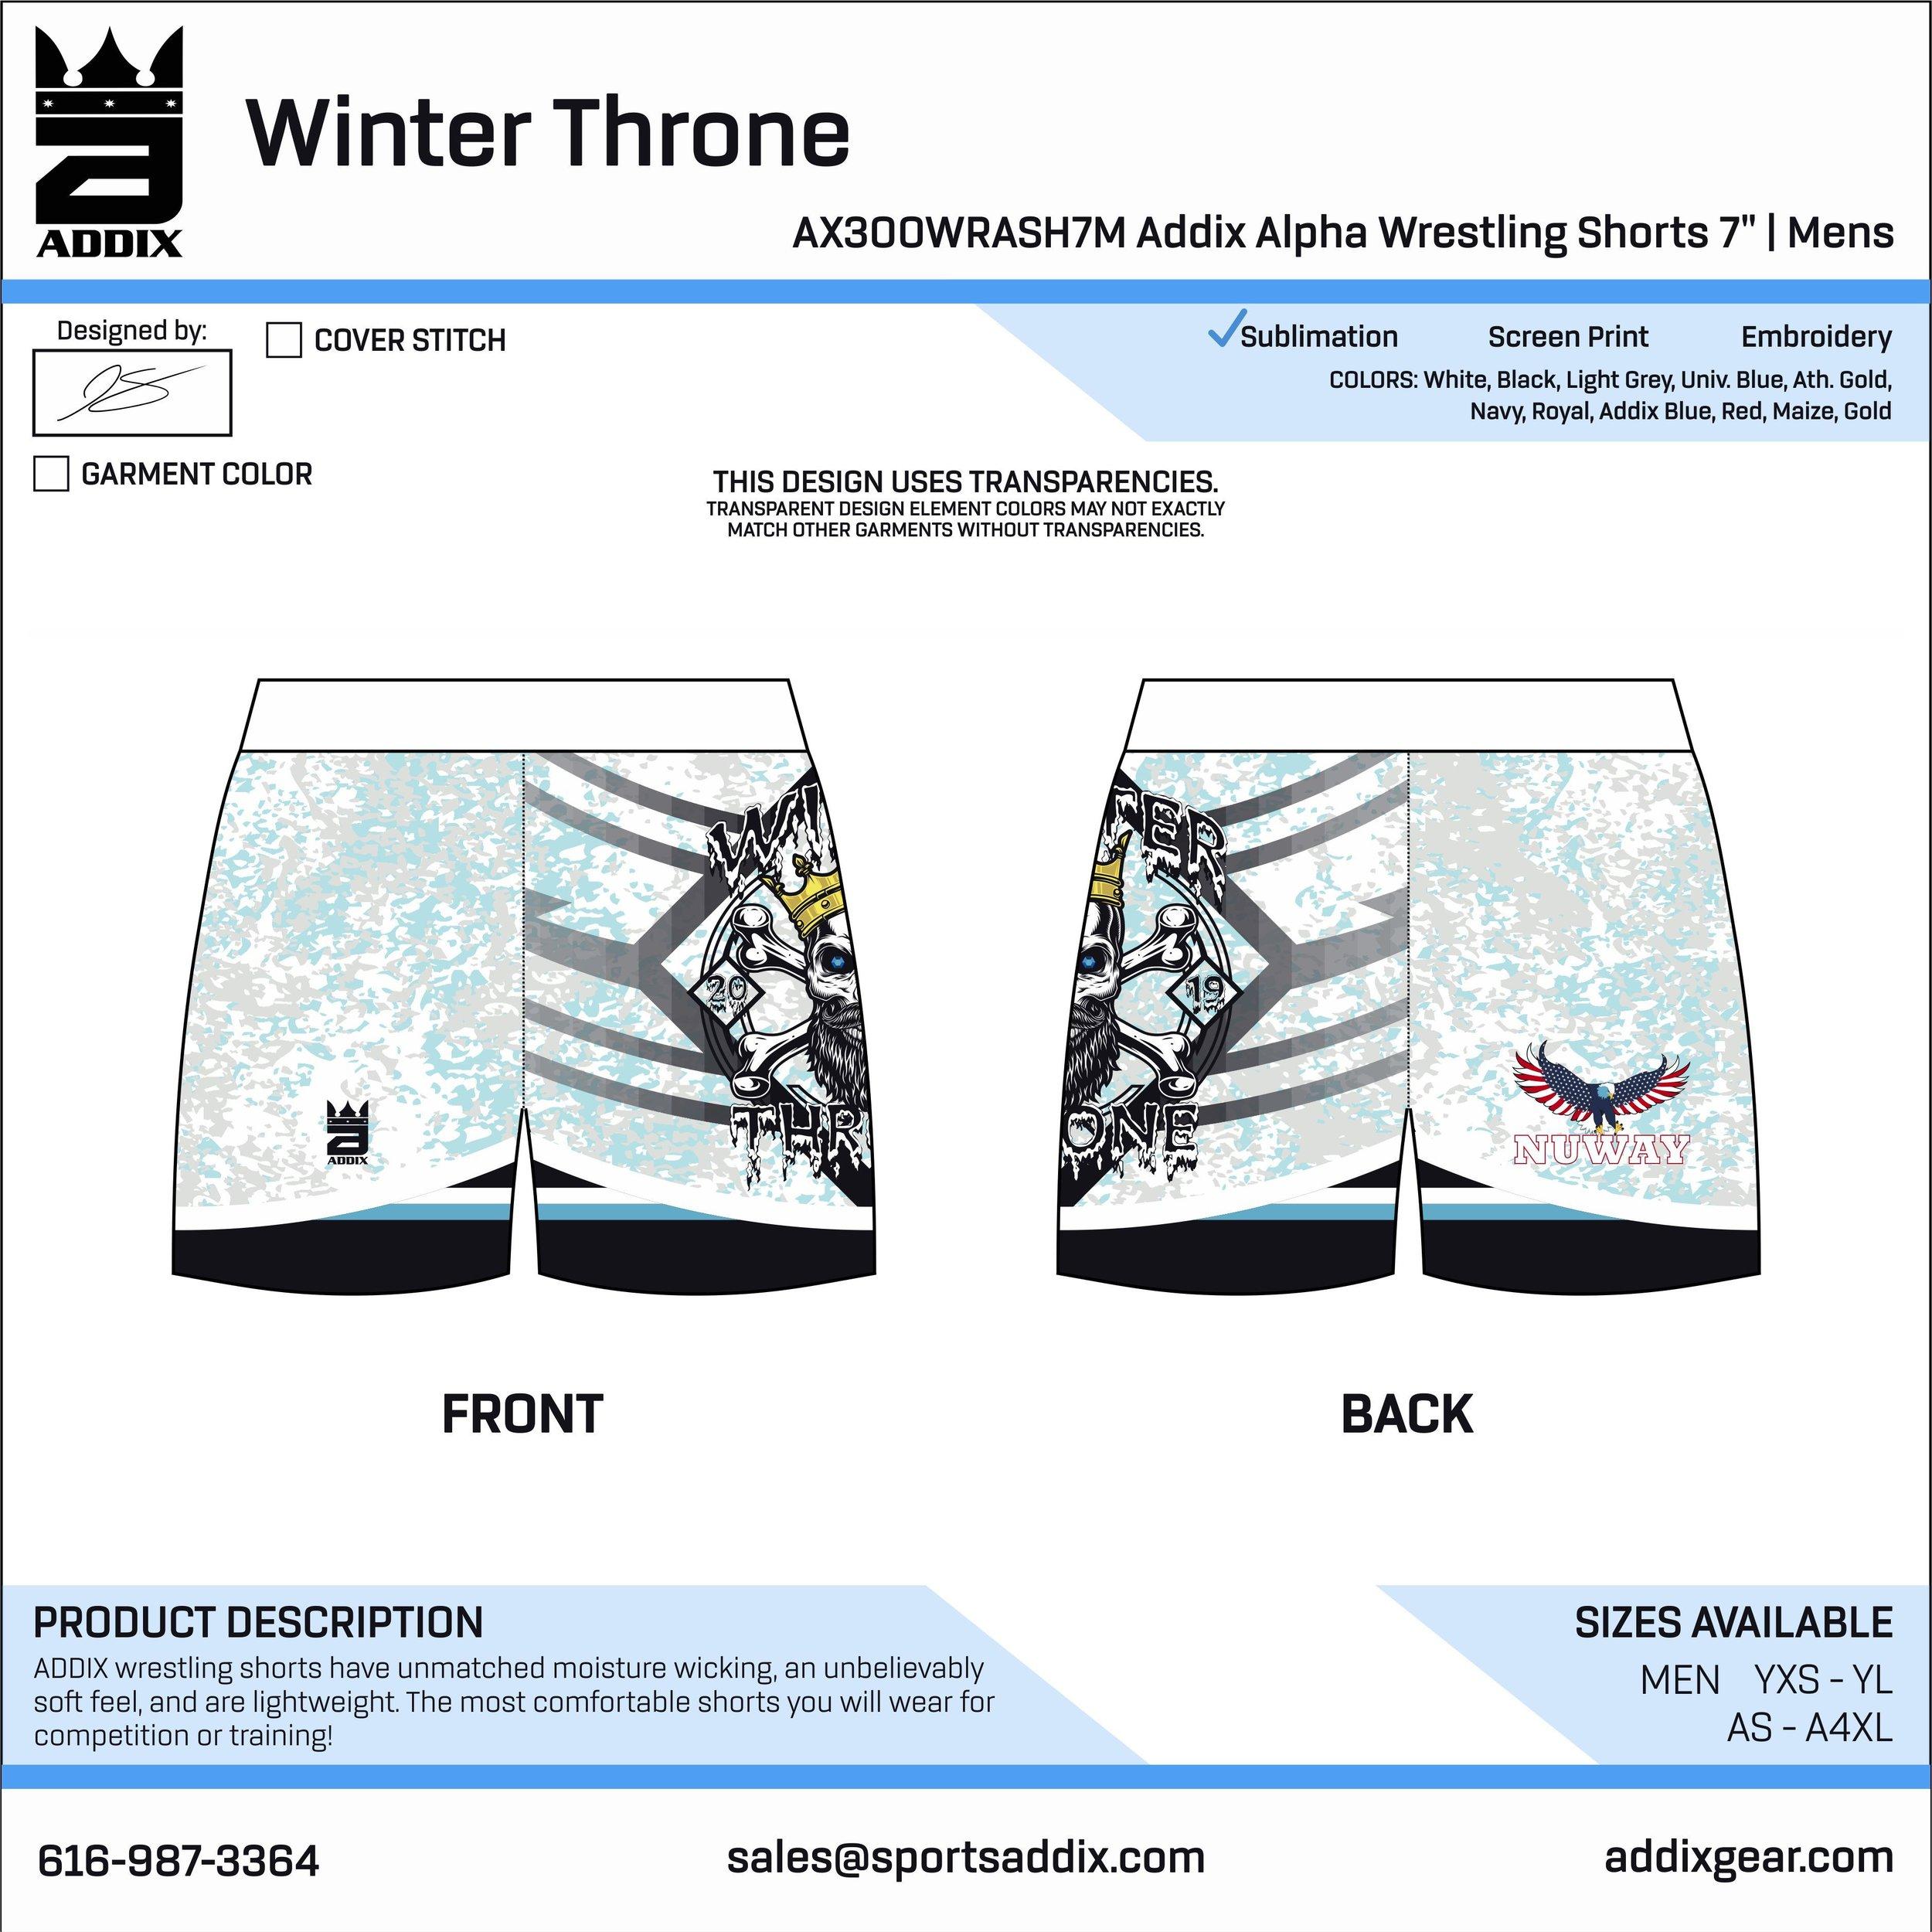 Winter Throne V2_2018_12-28_JE_Alpha Wrestling Shorts.jpg